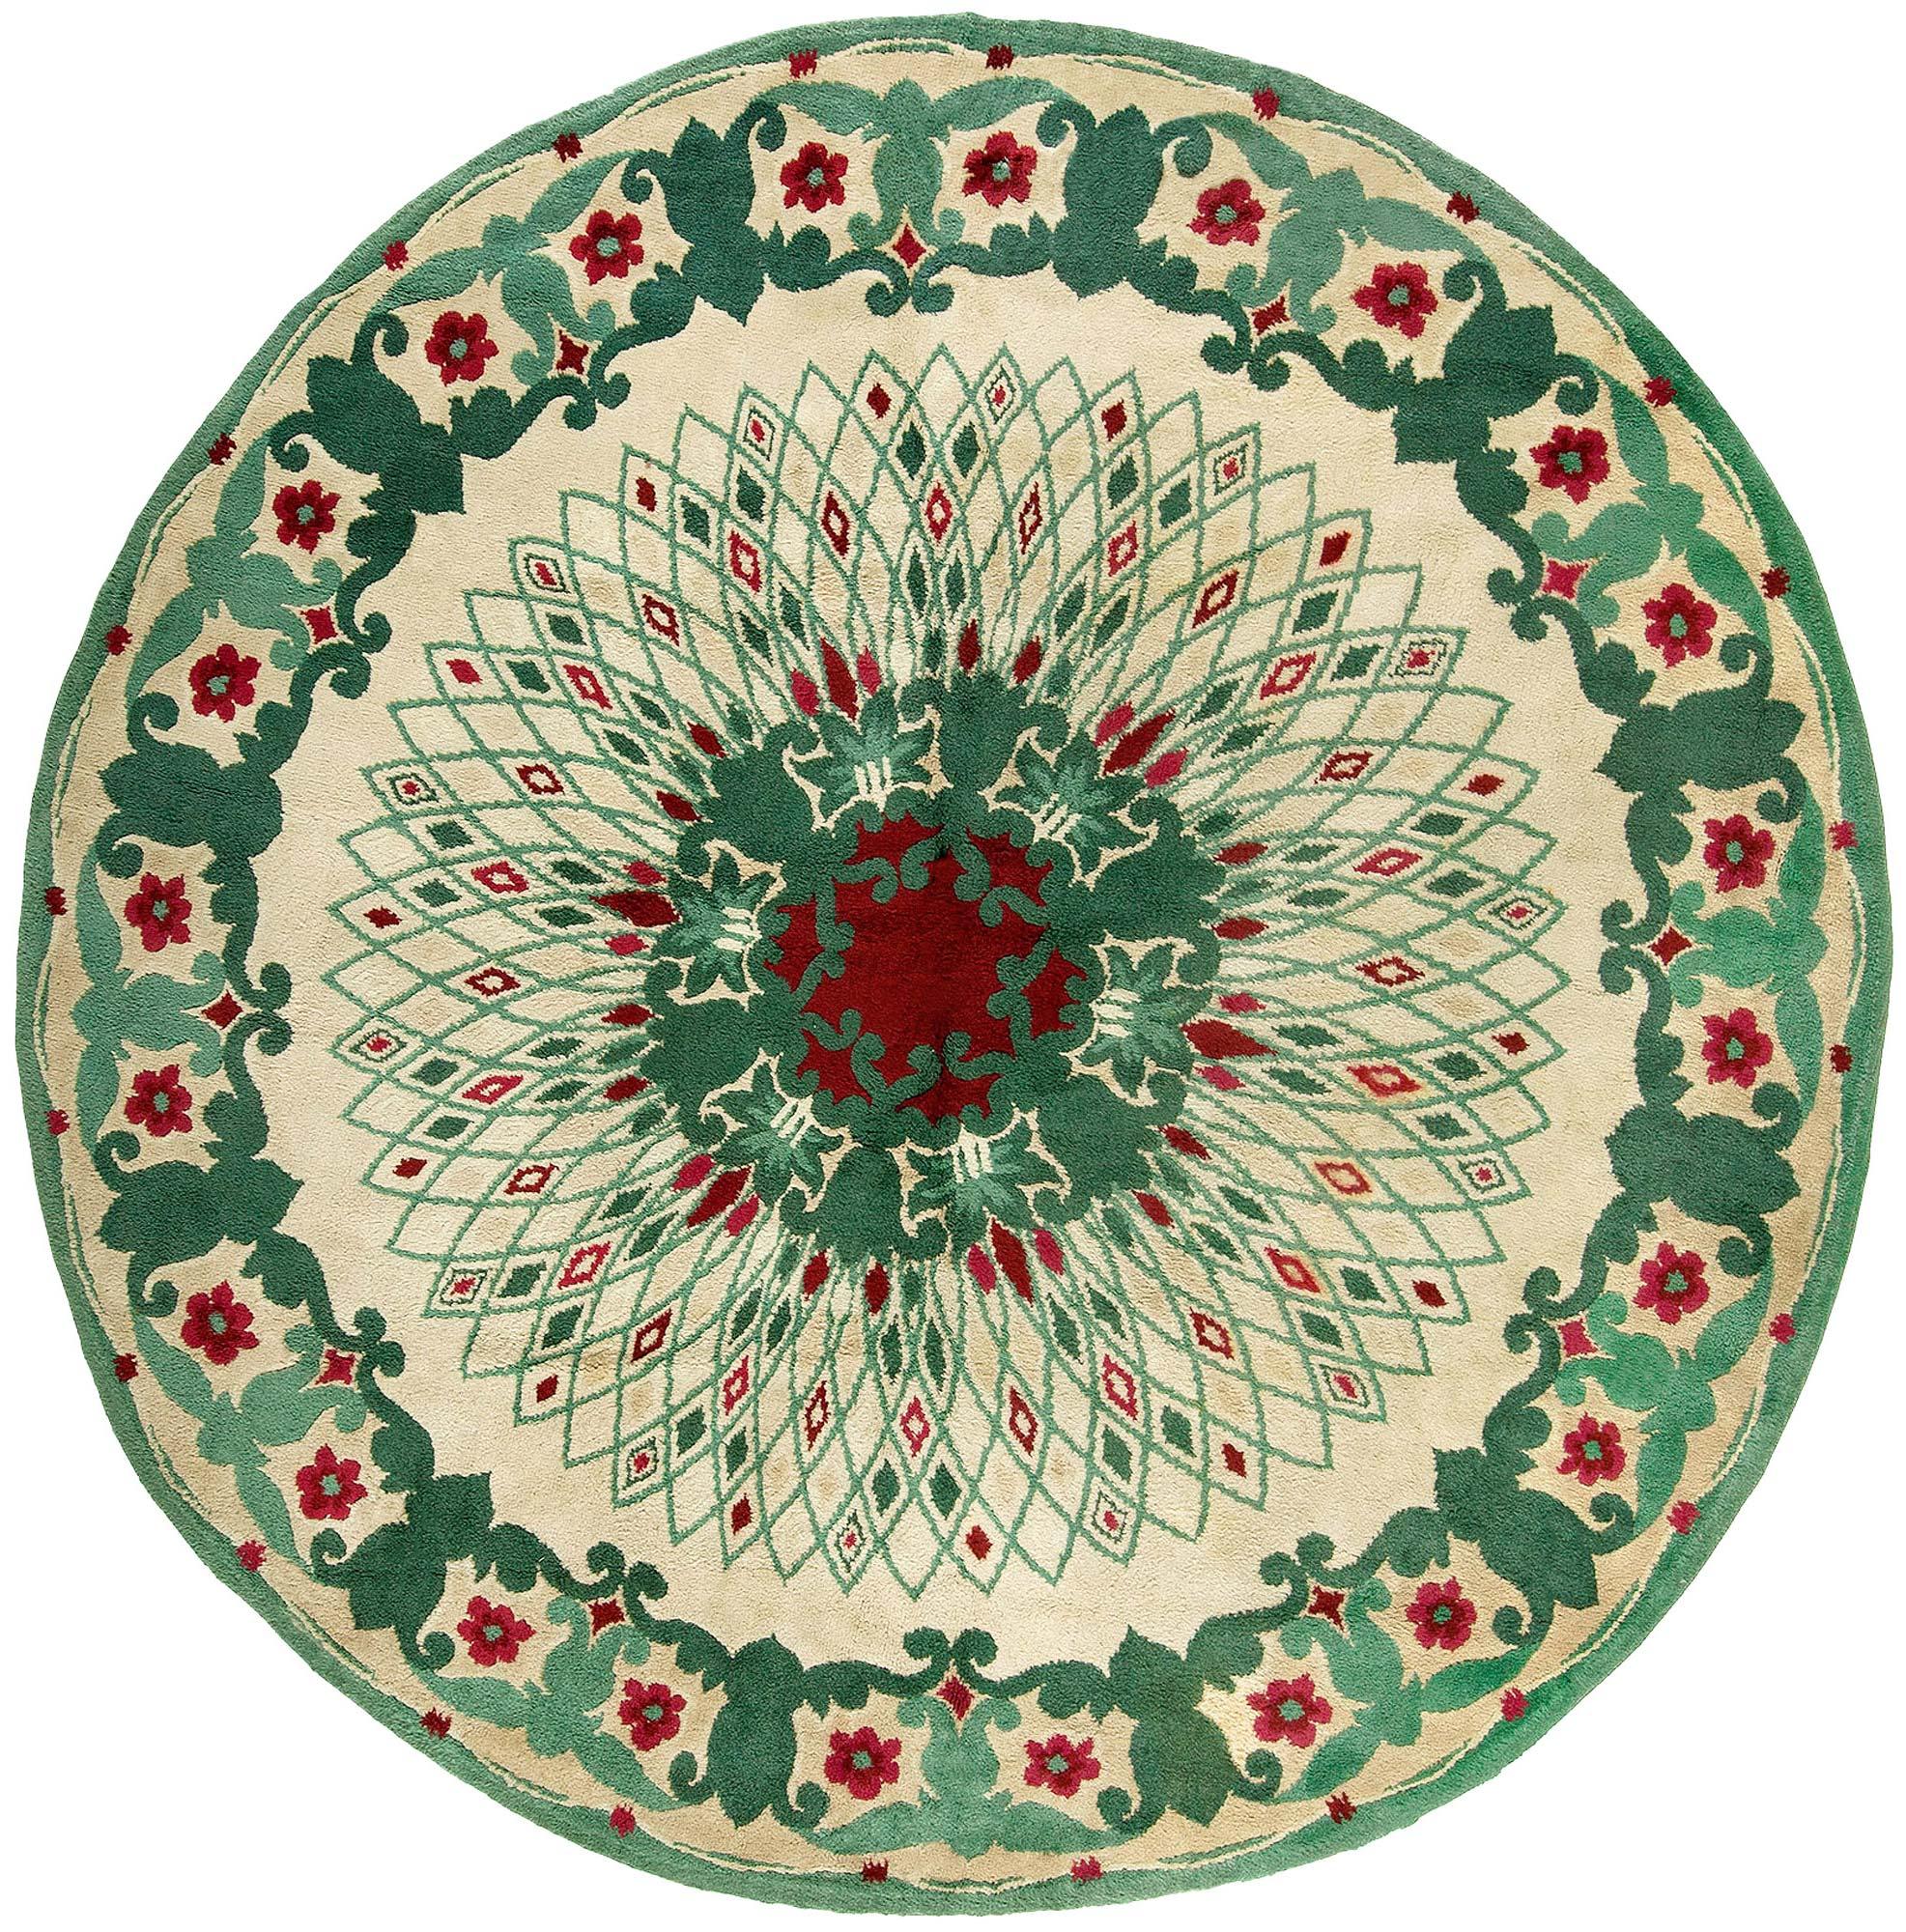 Art Deco Teppich von Paule Leleu BB4792